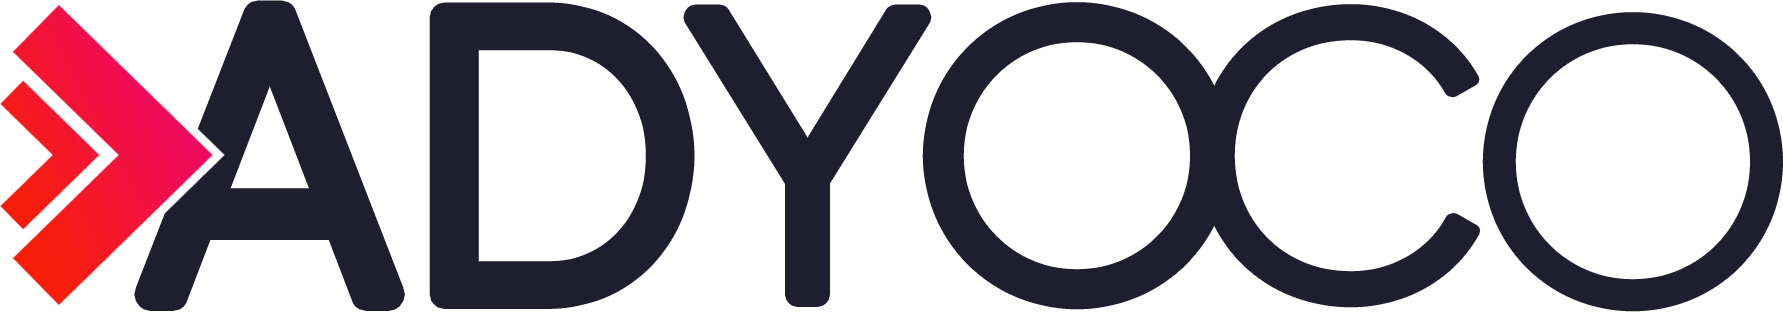 adyoco_logo_dark.png